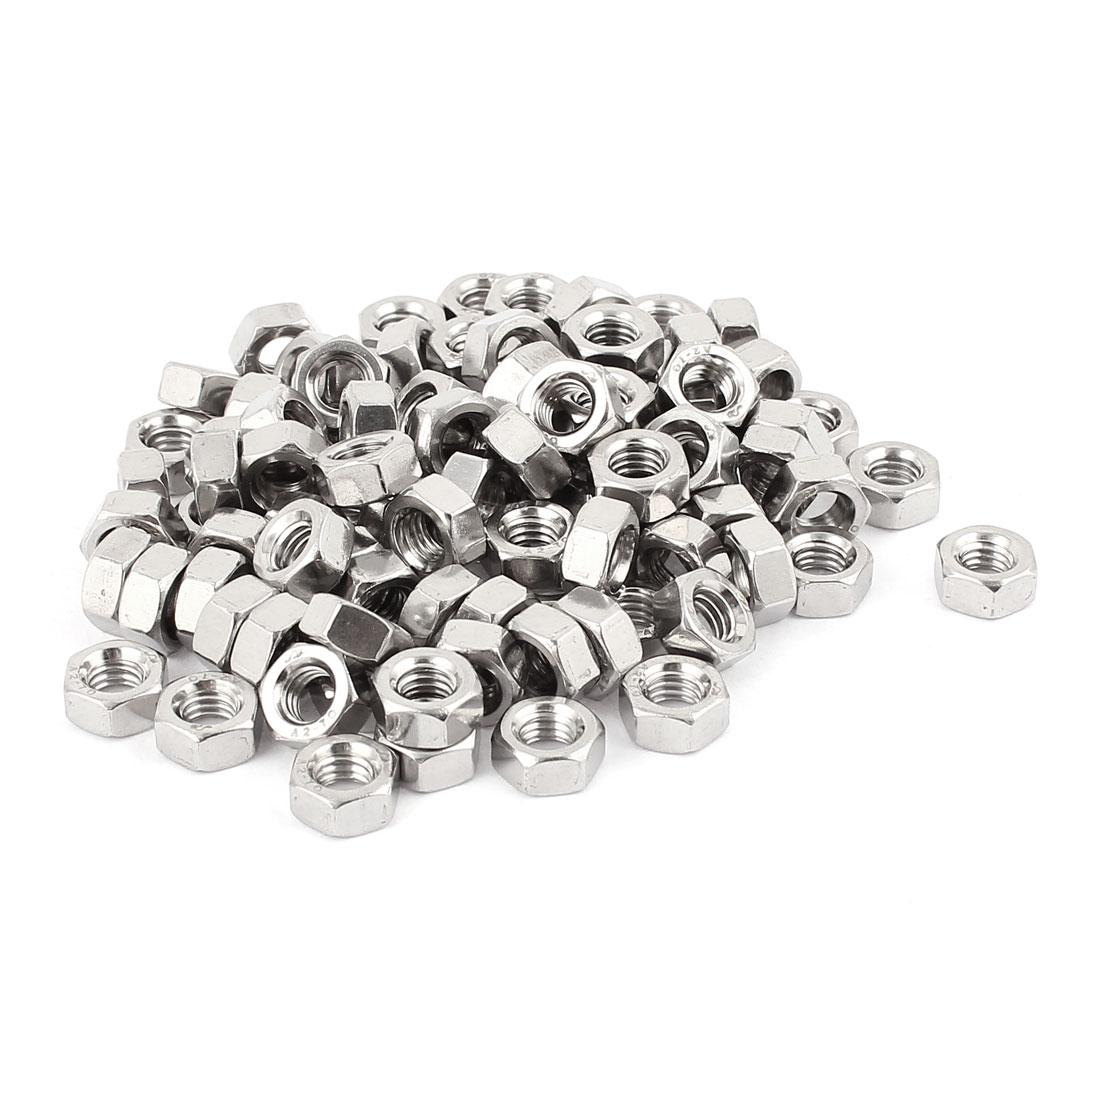 6mm Thread Dia Electric Machine Fastener Screws Hex Nut Silver Tone 100Pcs